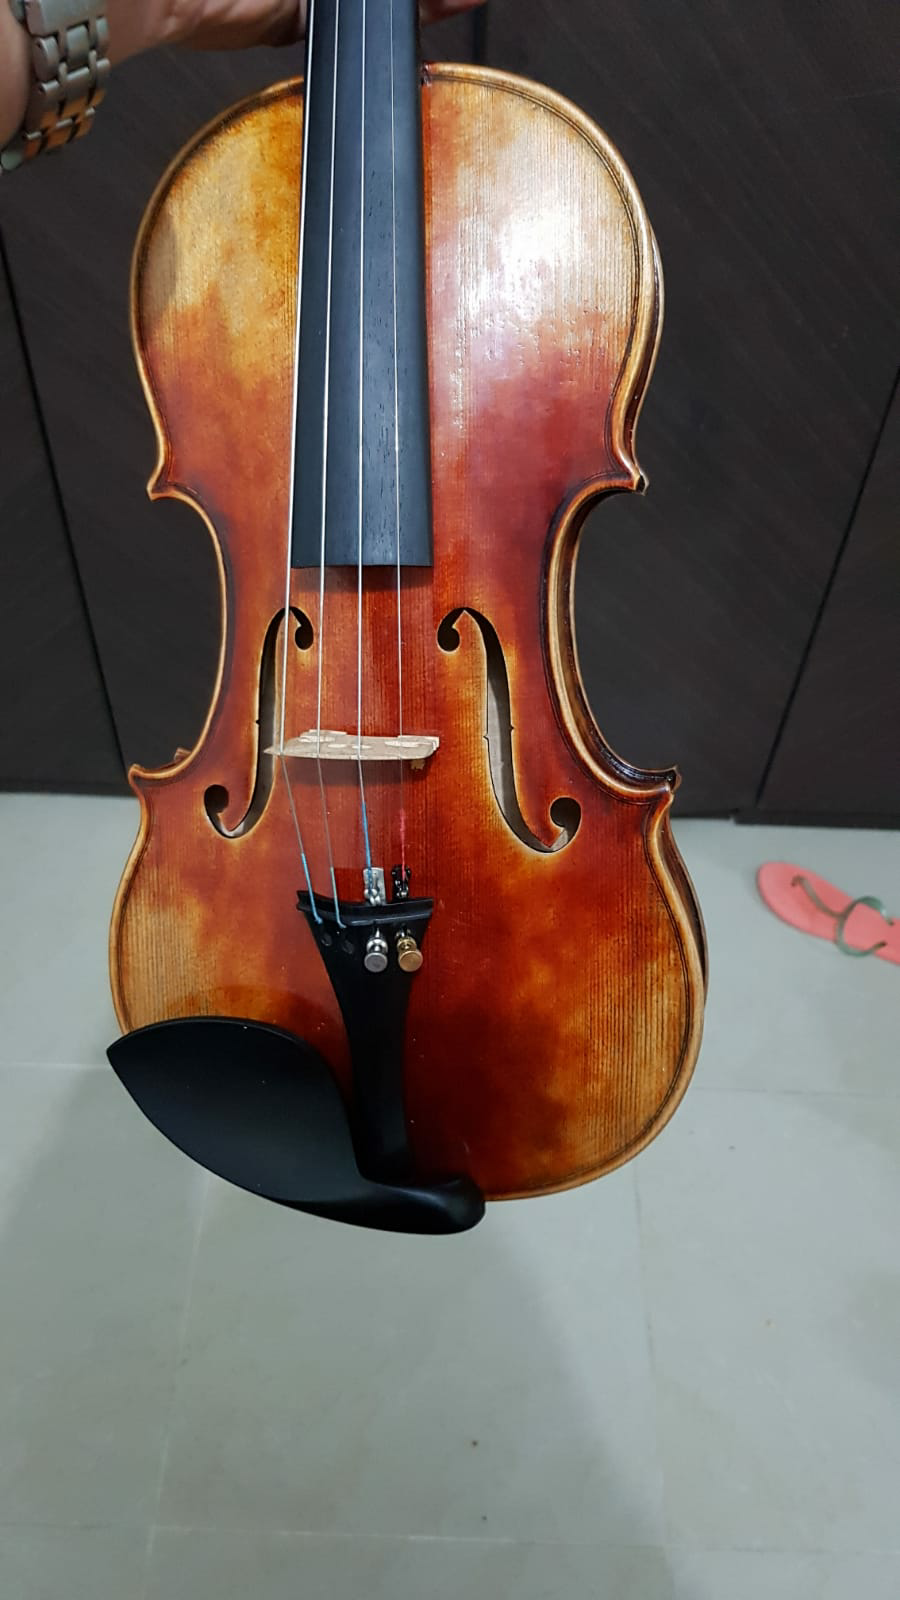 Handmade violin 4/4